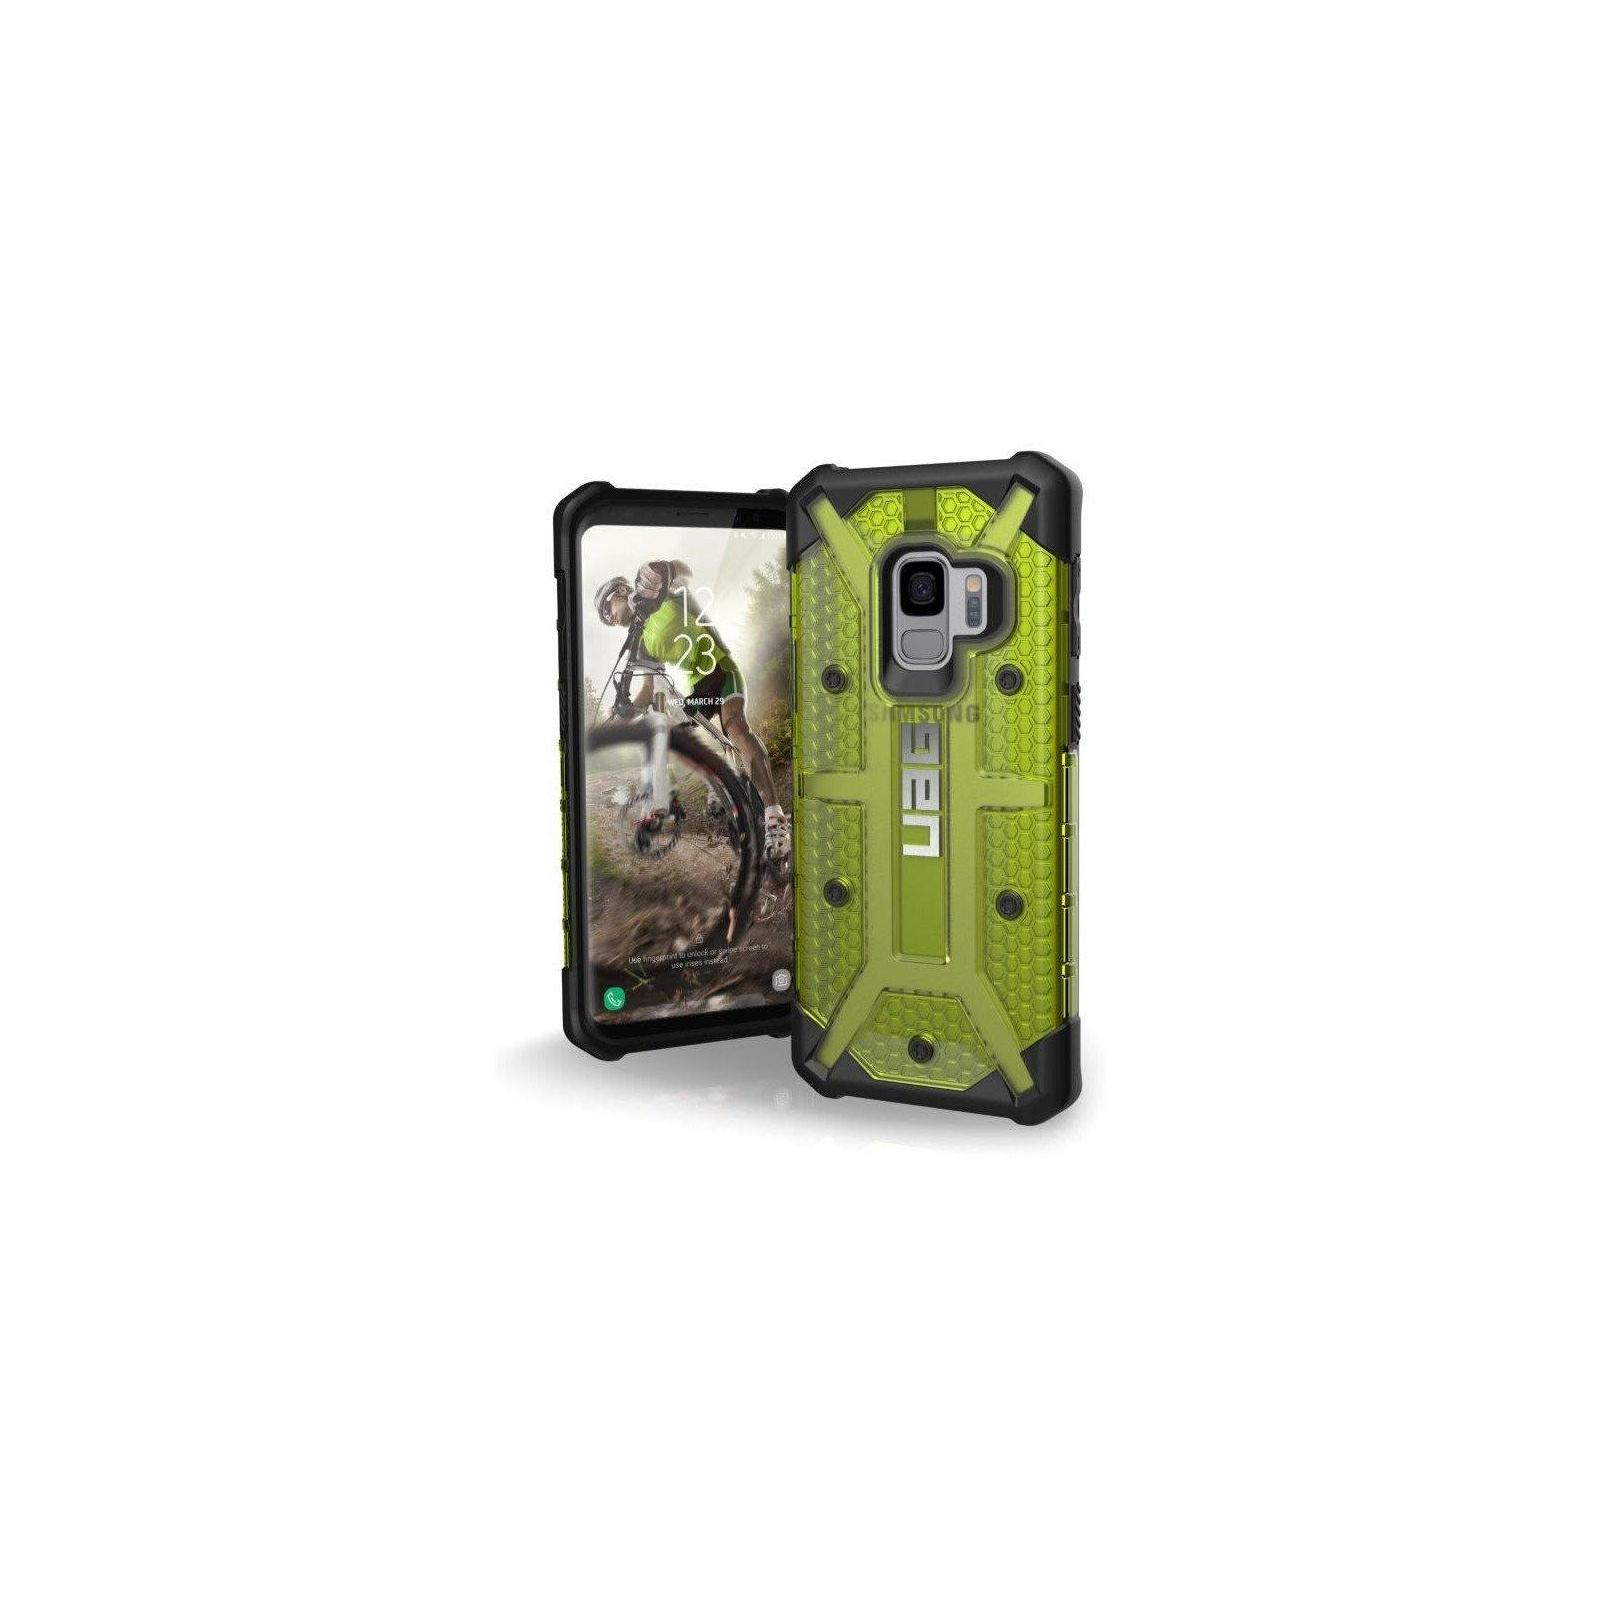 Чехол для моб. телефона Urban Armor Gear Galaxy S9 Plasma Citron (GLXS9-L-CT) изображение 6